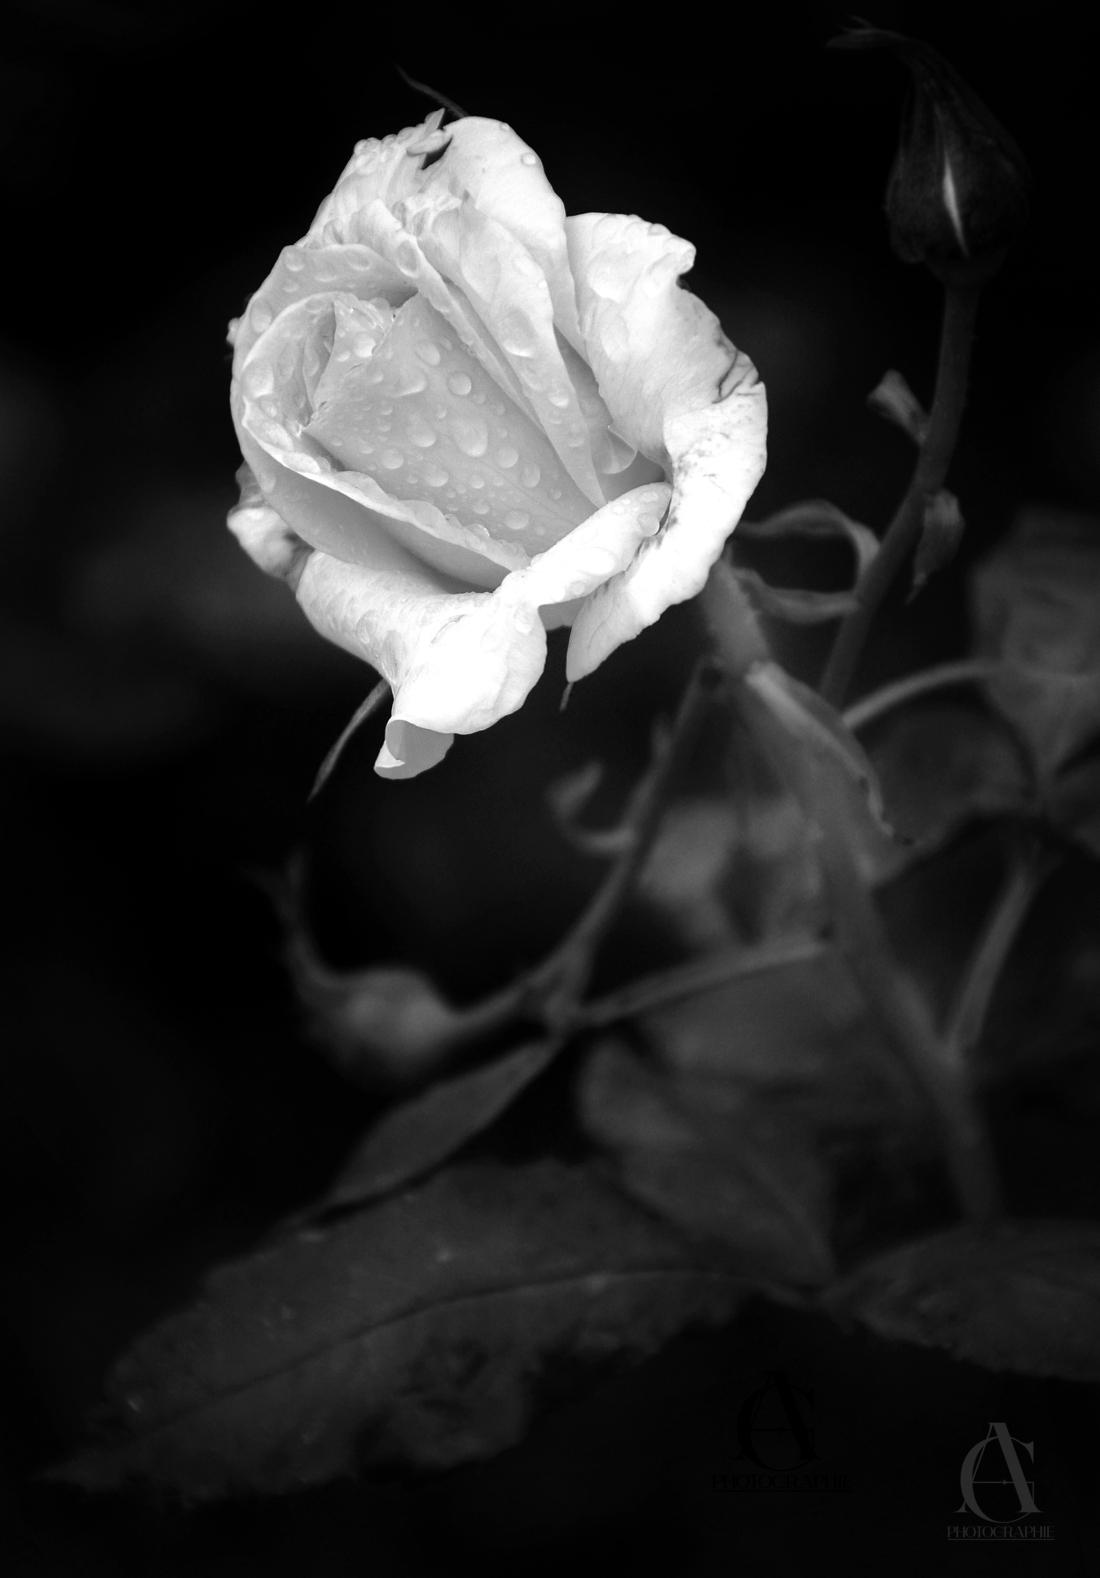 Retouche bw rose - 1